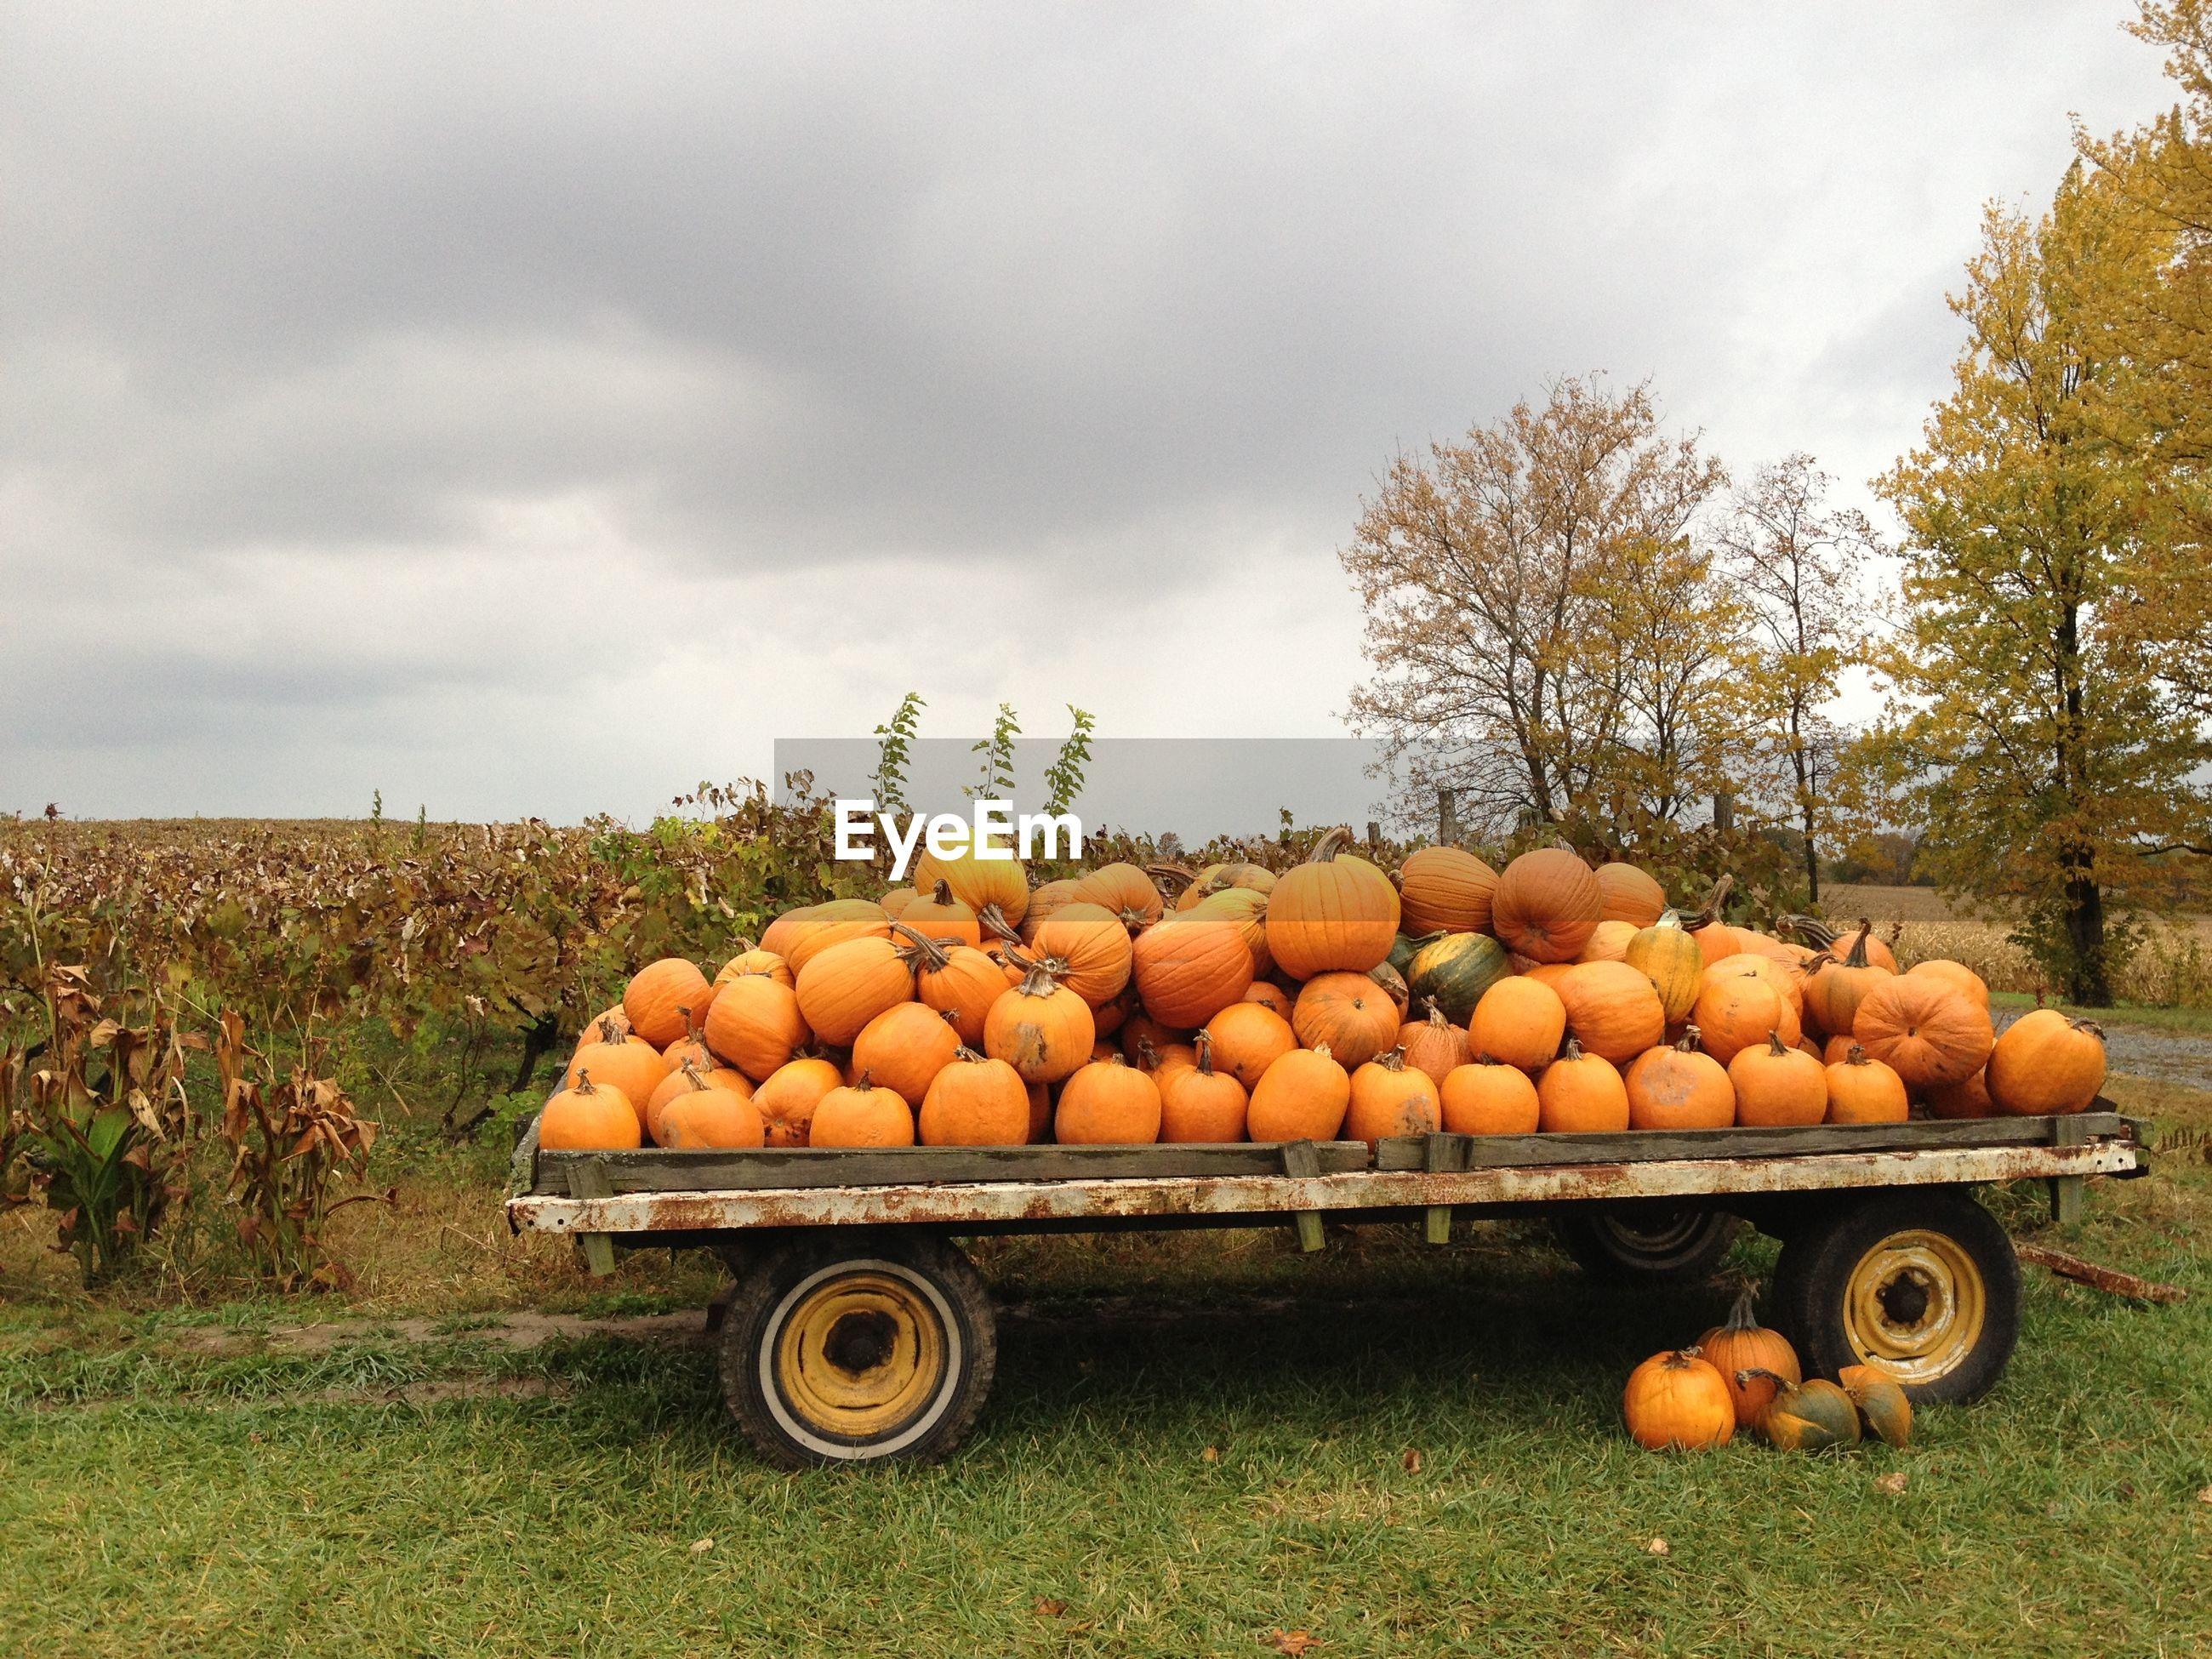 Pumpkins on cart at field against sky